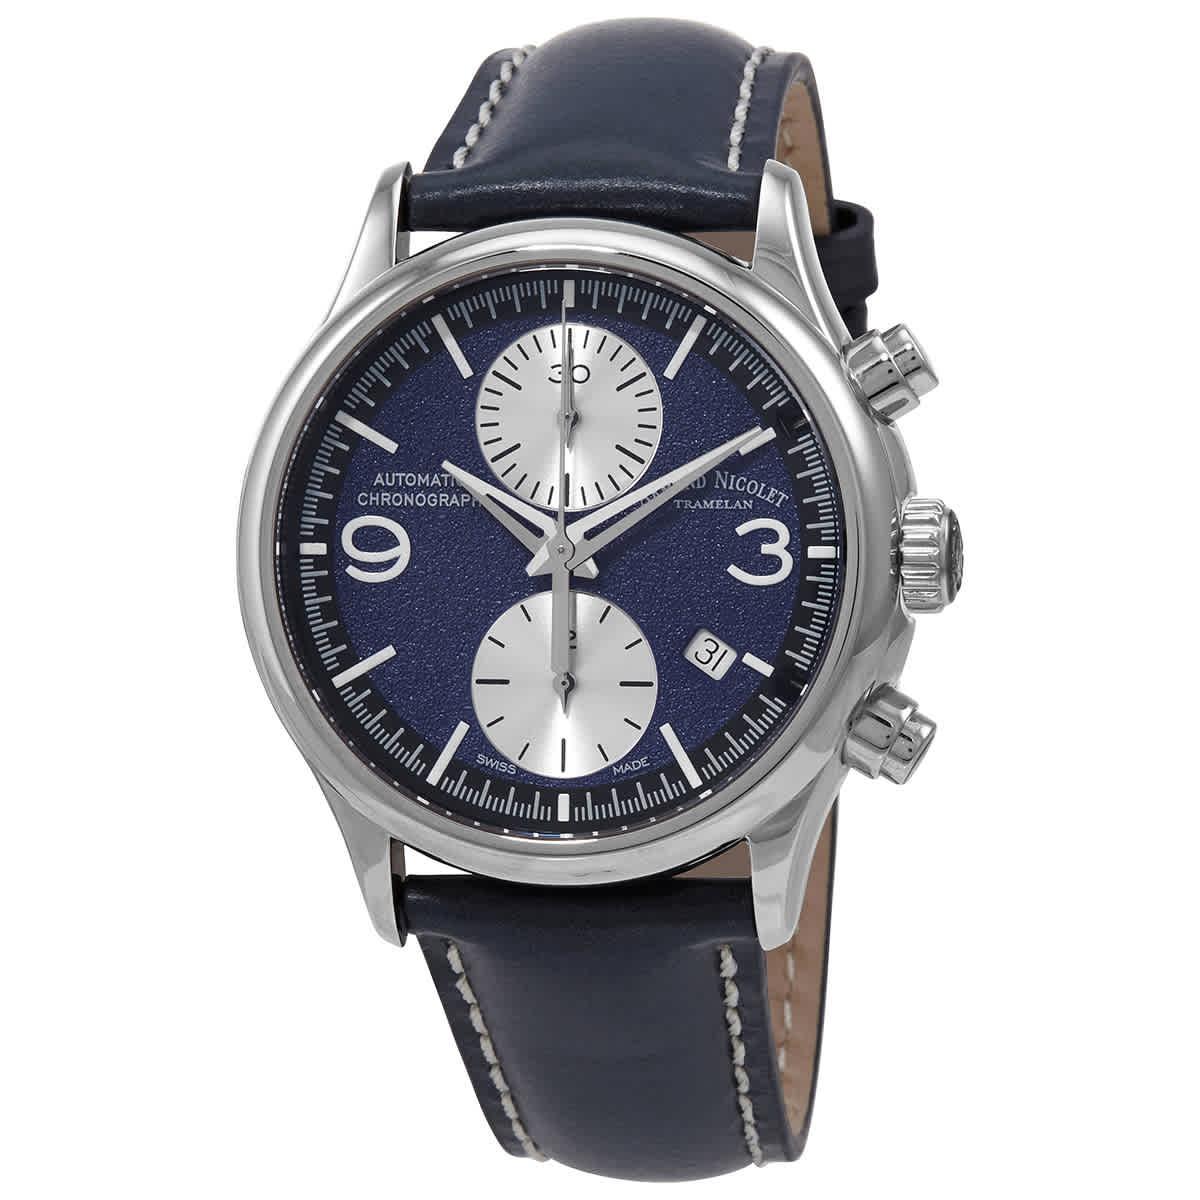 Armand Nicolet Mha Chronograph Automatic Dark Blue Dial Mens Watch A844haa-bu-p140bu2 In Blue,silver Tone